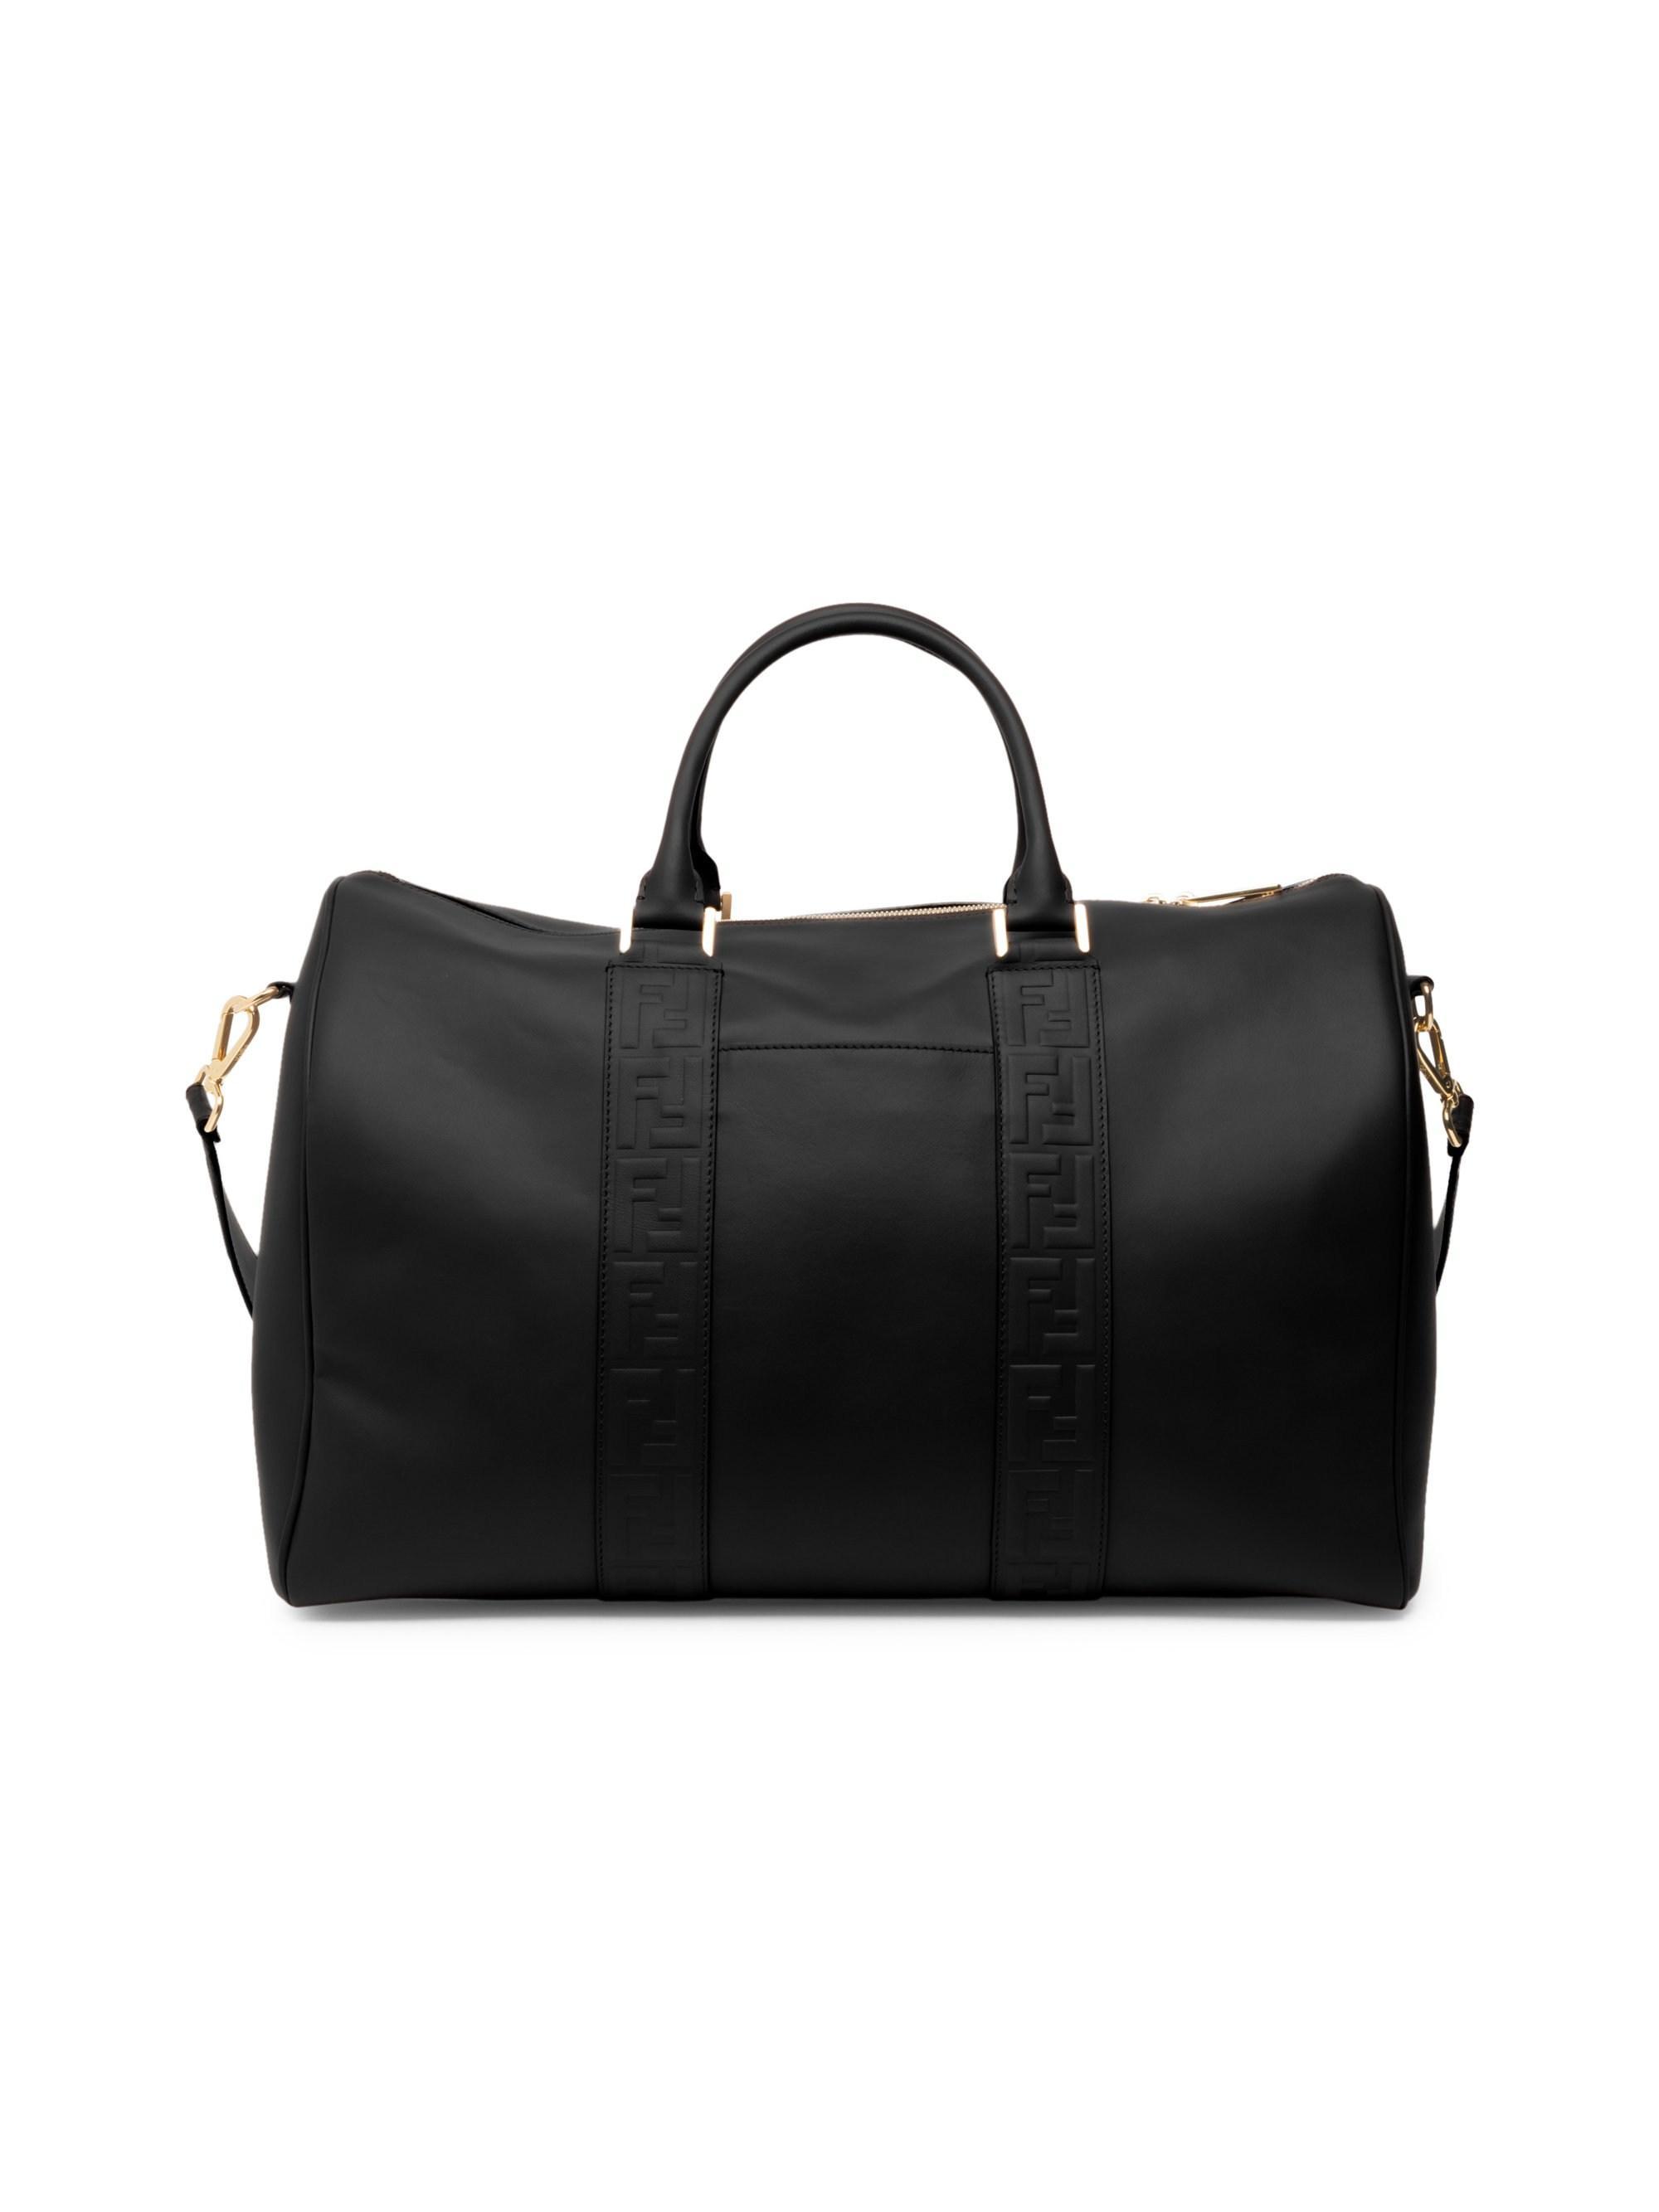 Lyst - Fendi Men s Logo Embossed Leather Duffel - Black in Black for Men 3ff21cc1bf022